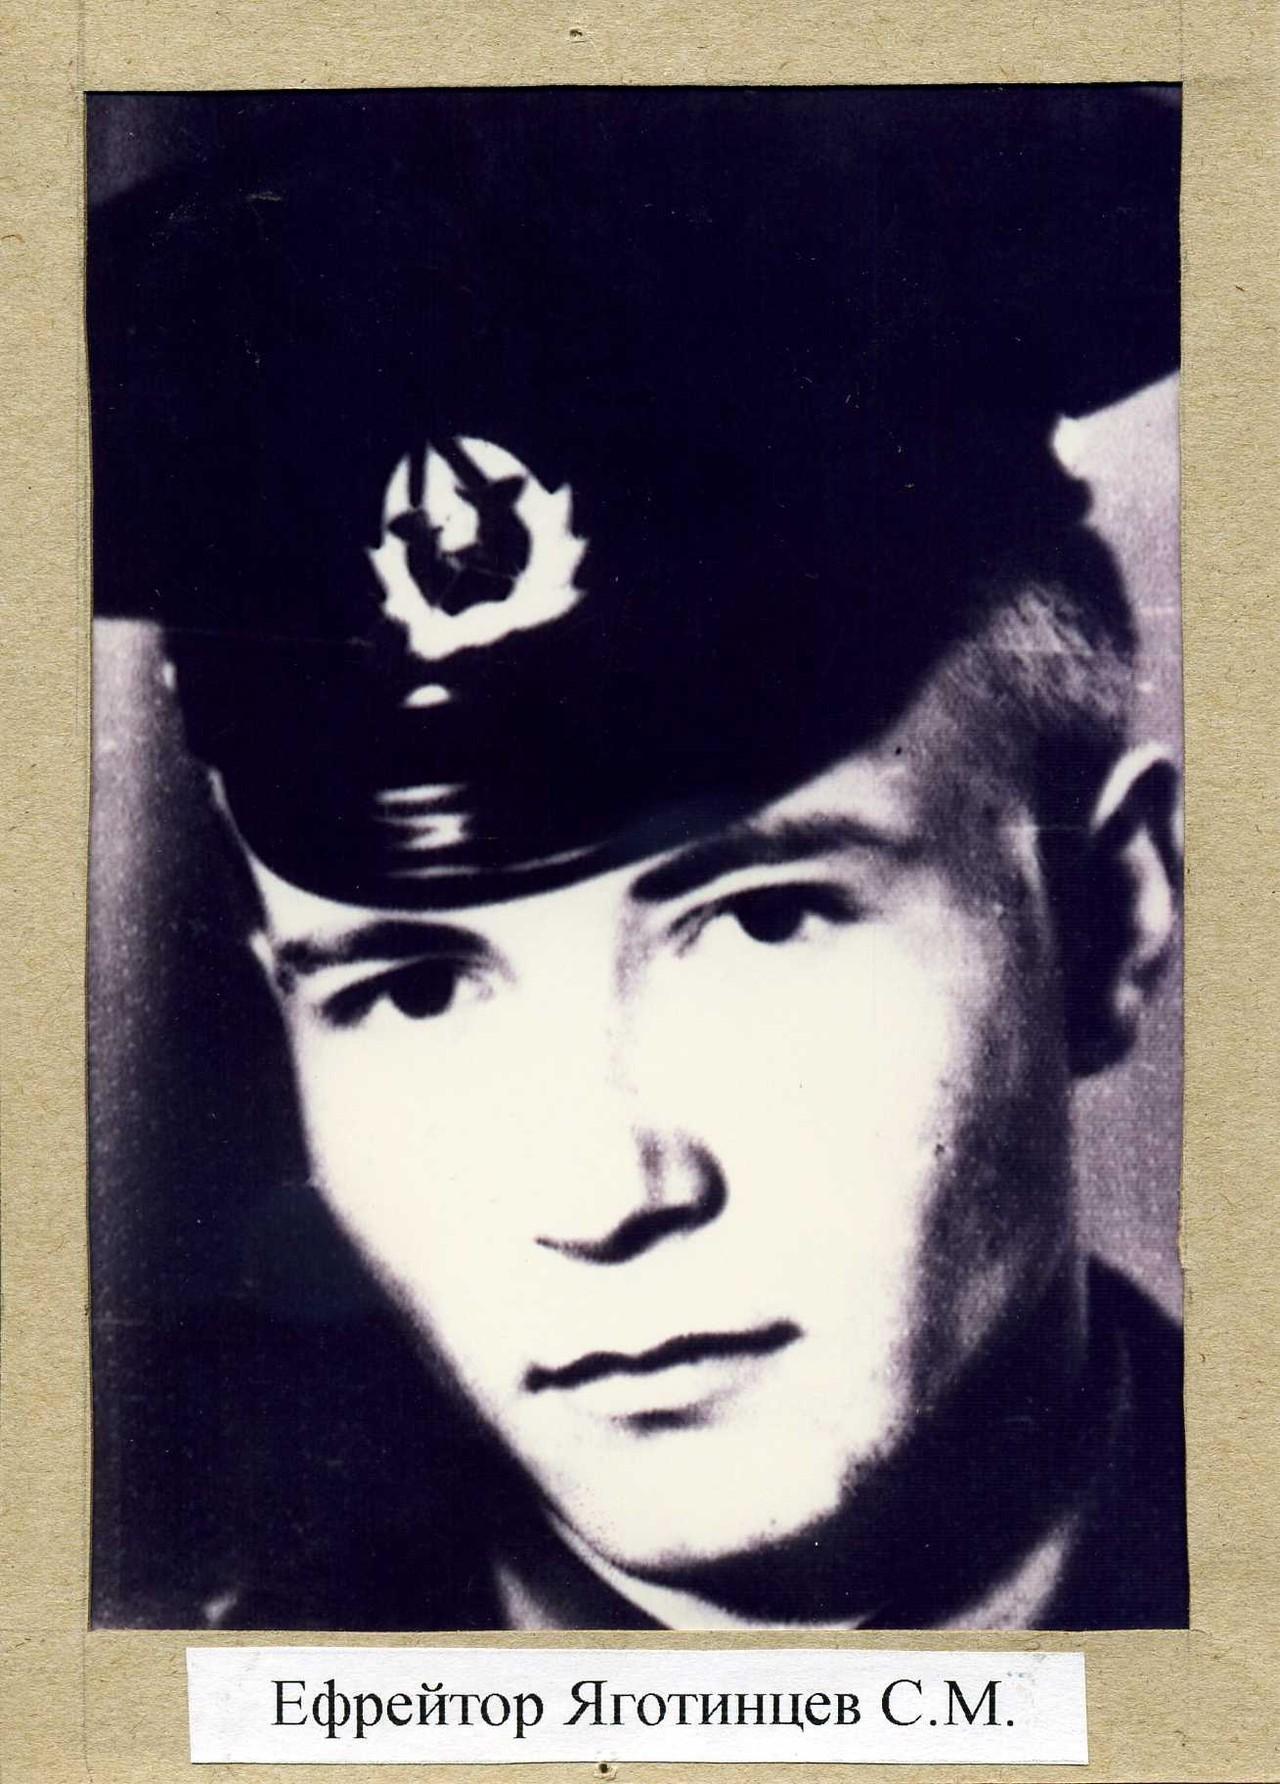 Яготинцев Сергей Михайлович